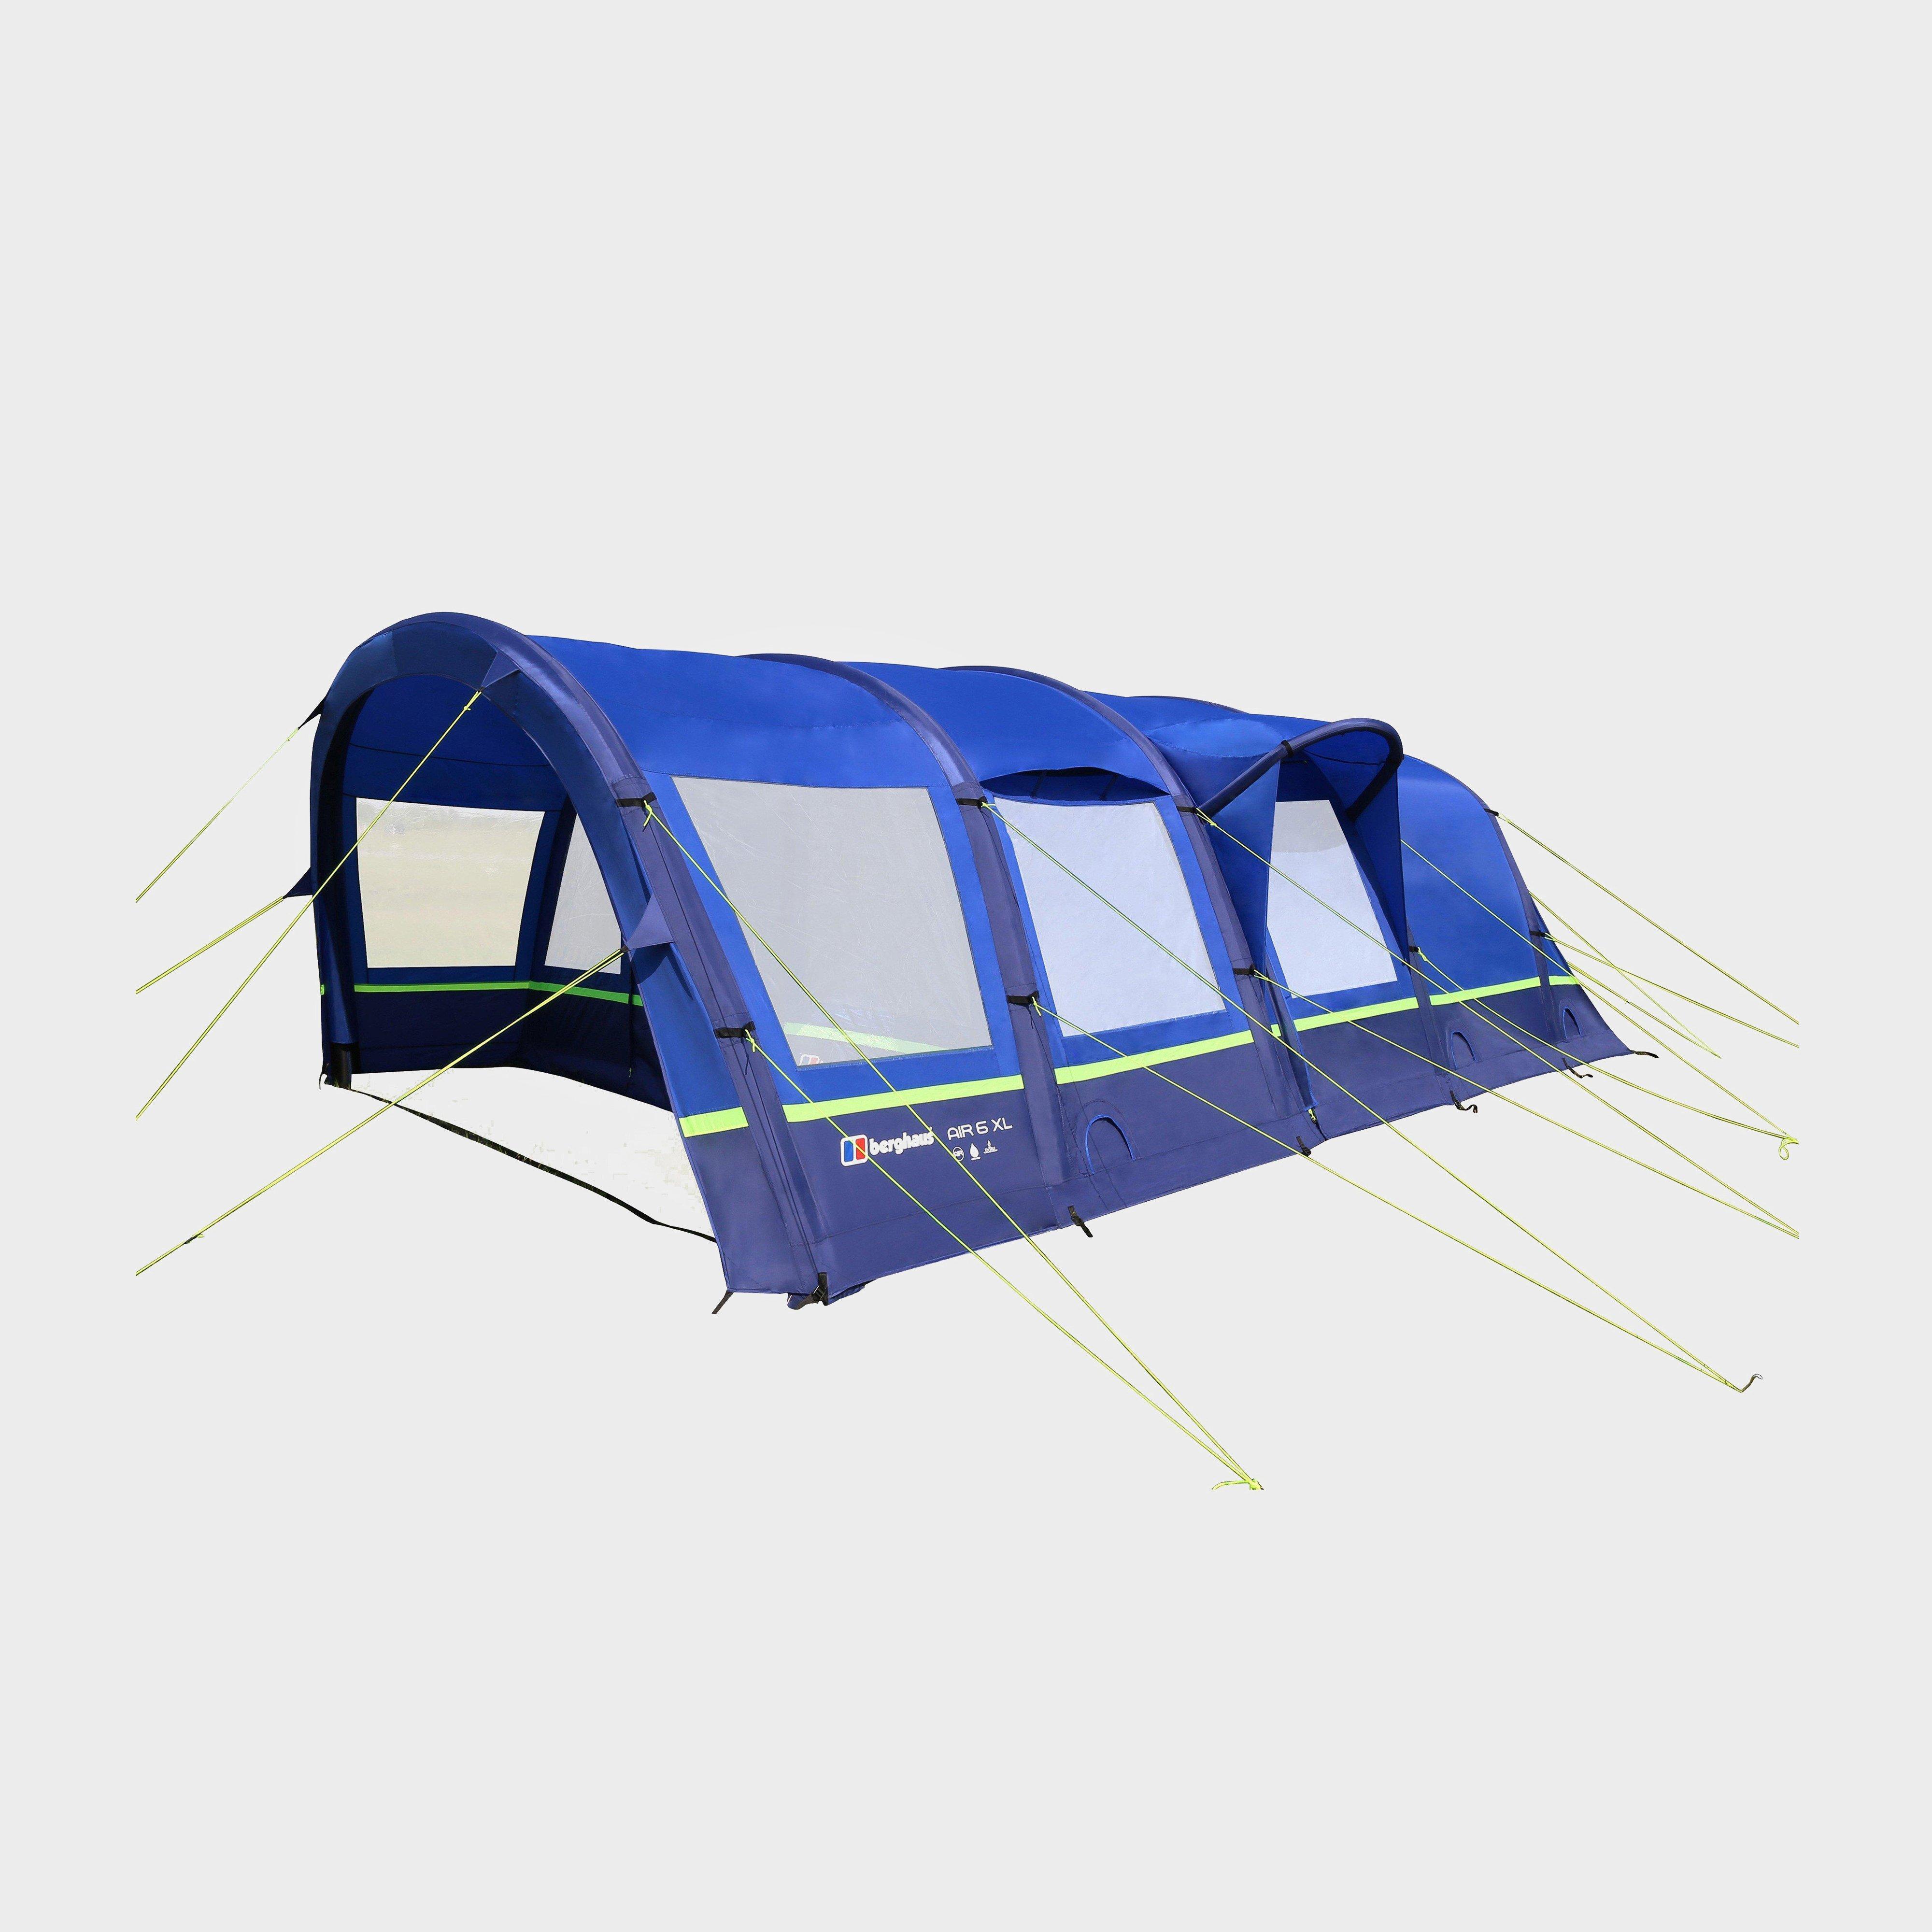 Berghaus Air 6XL Tent, Blue/MBL